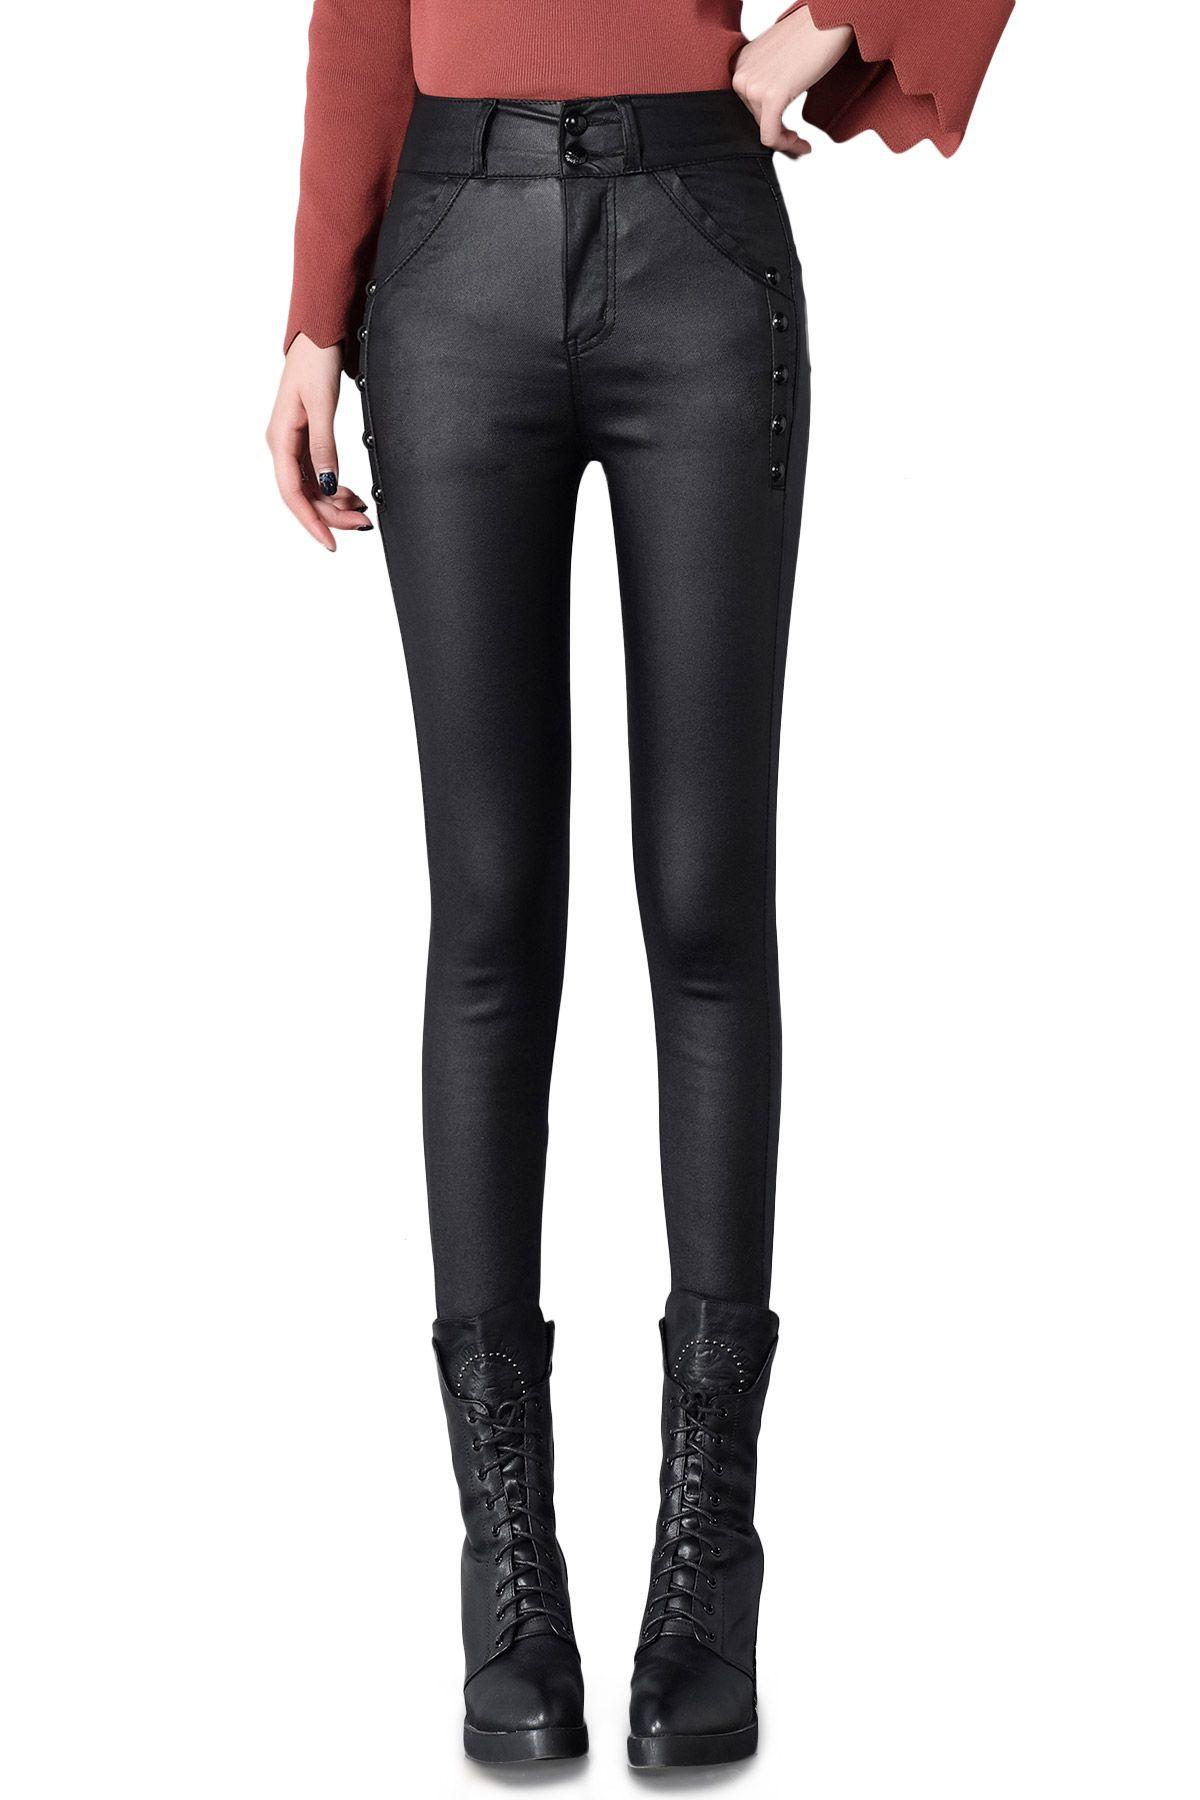 Relatively 2018 Fashion Women Faux Leather Pants Skinny Leggings Black Solid  EB99